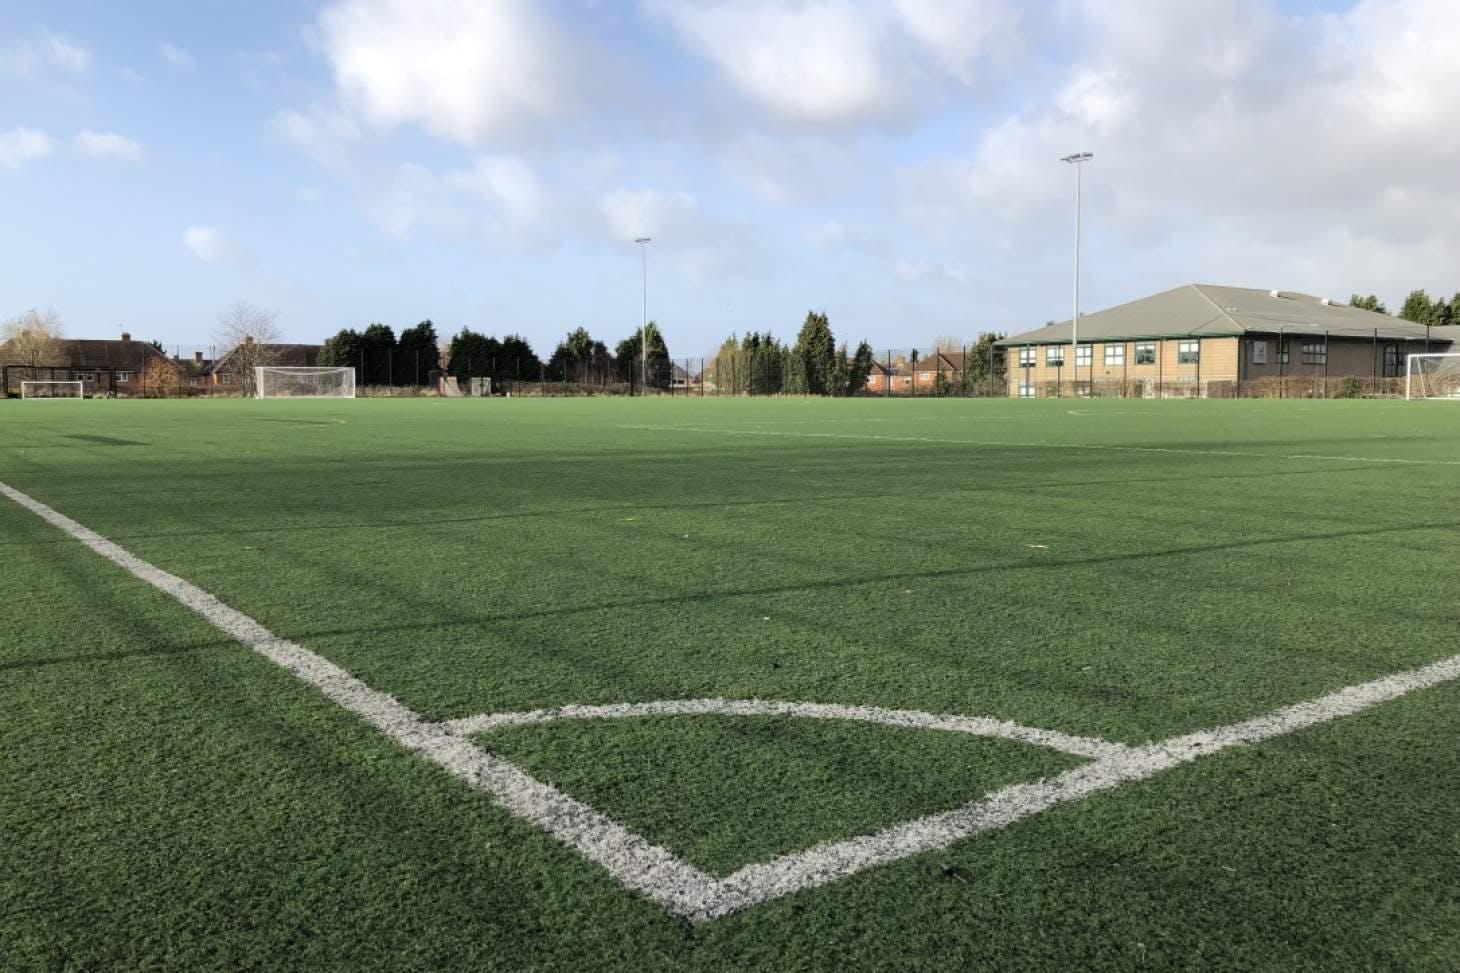 John Madejski Academy (White Horse Federation) 5 a side   3G Astroturf football pitch